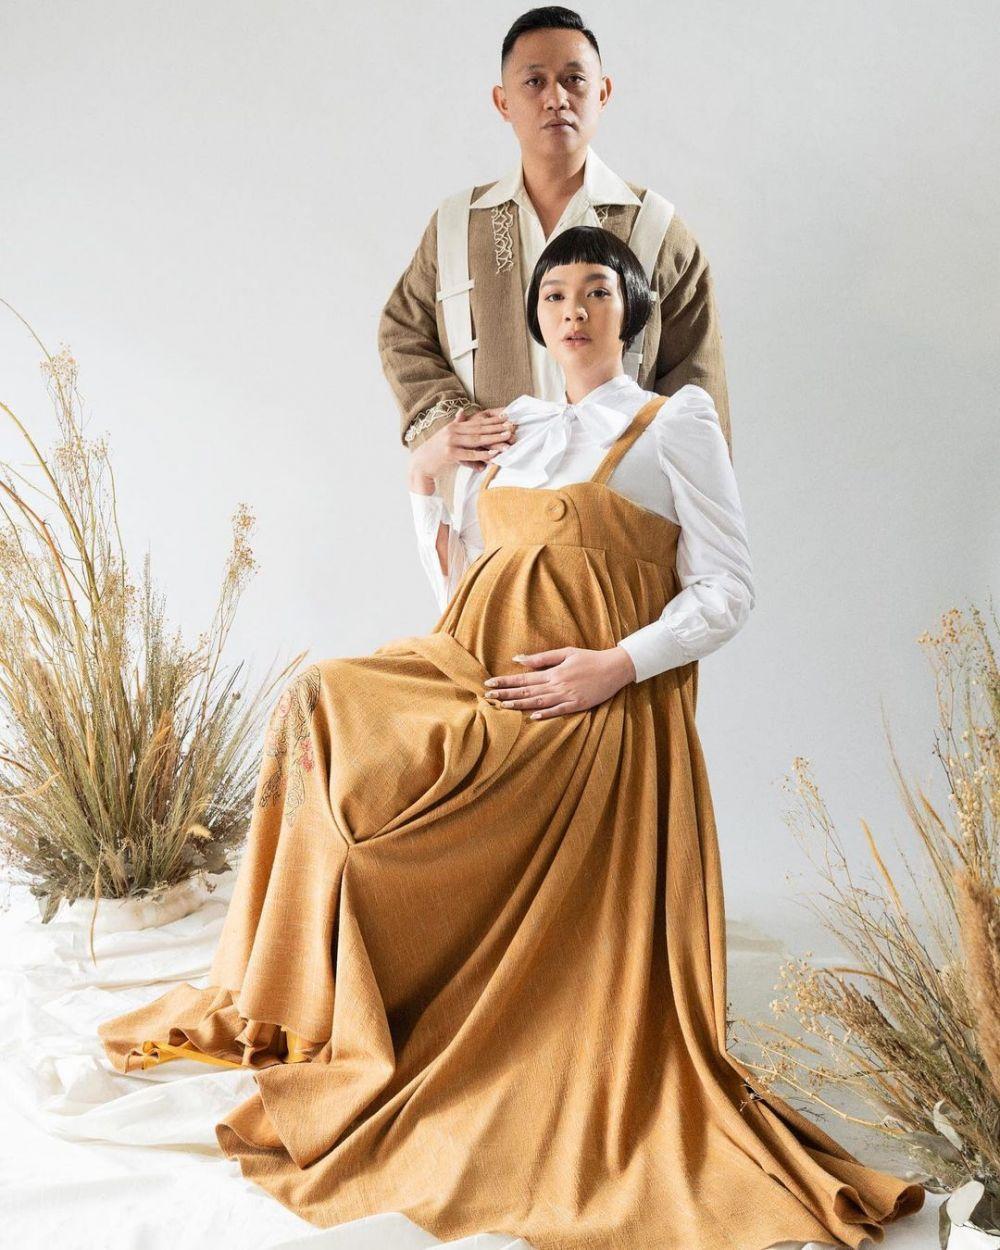 Potret maternity Kezia dan suami © Instagram